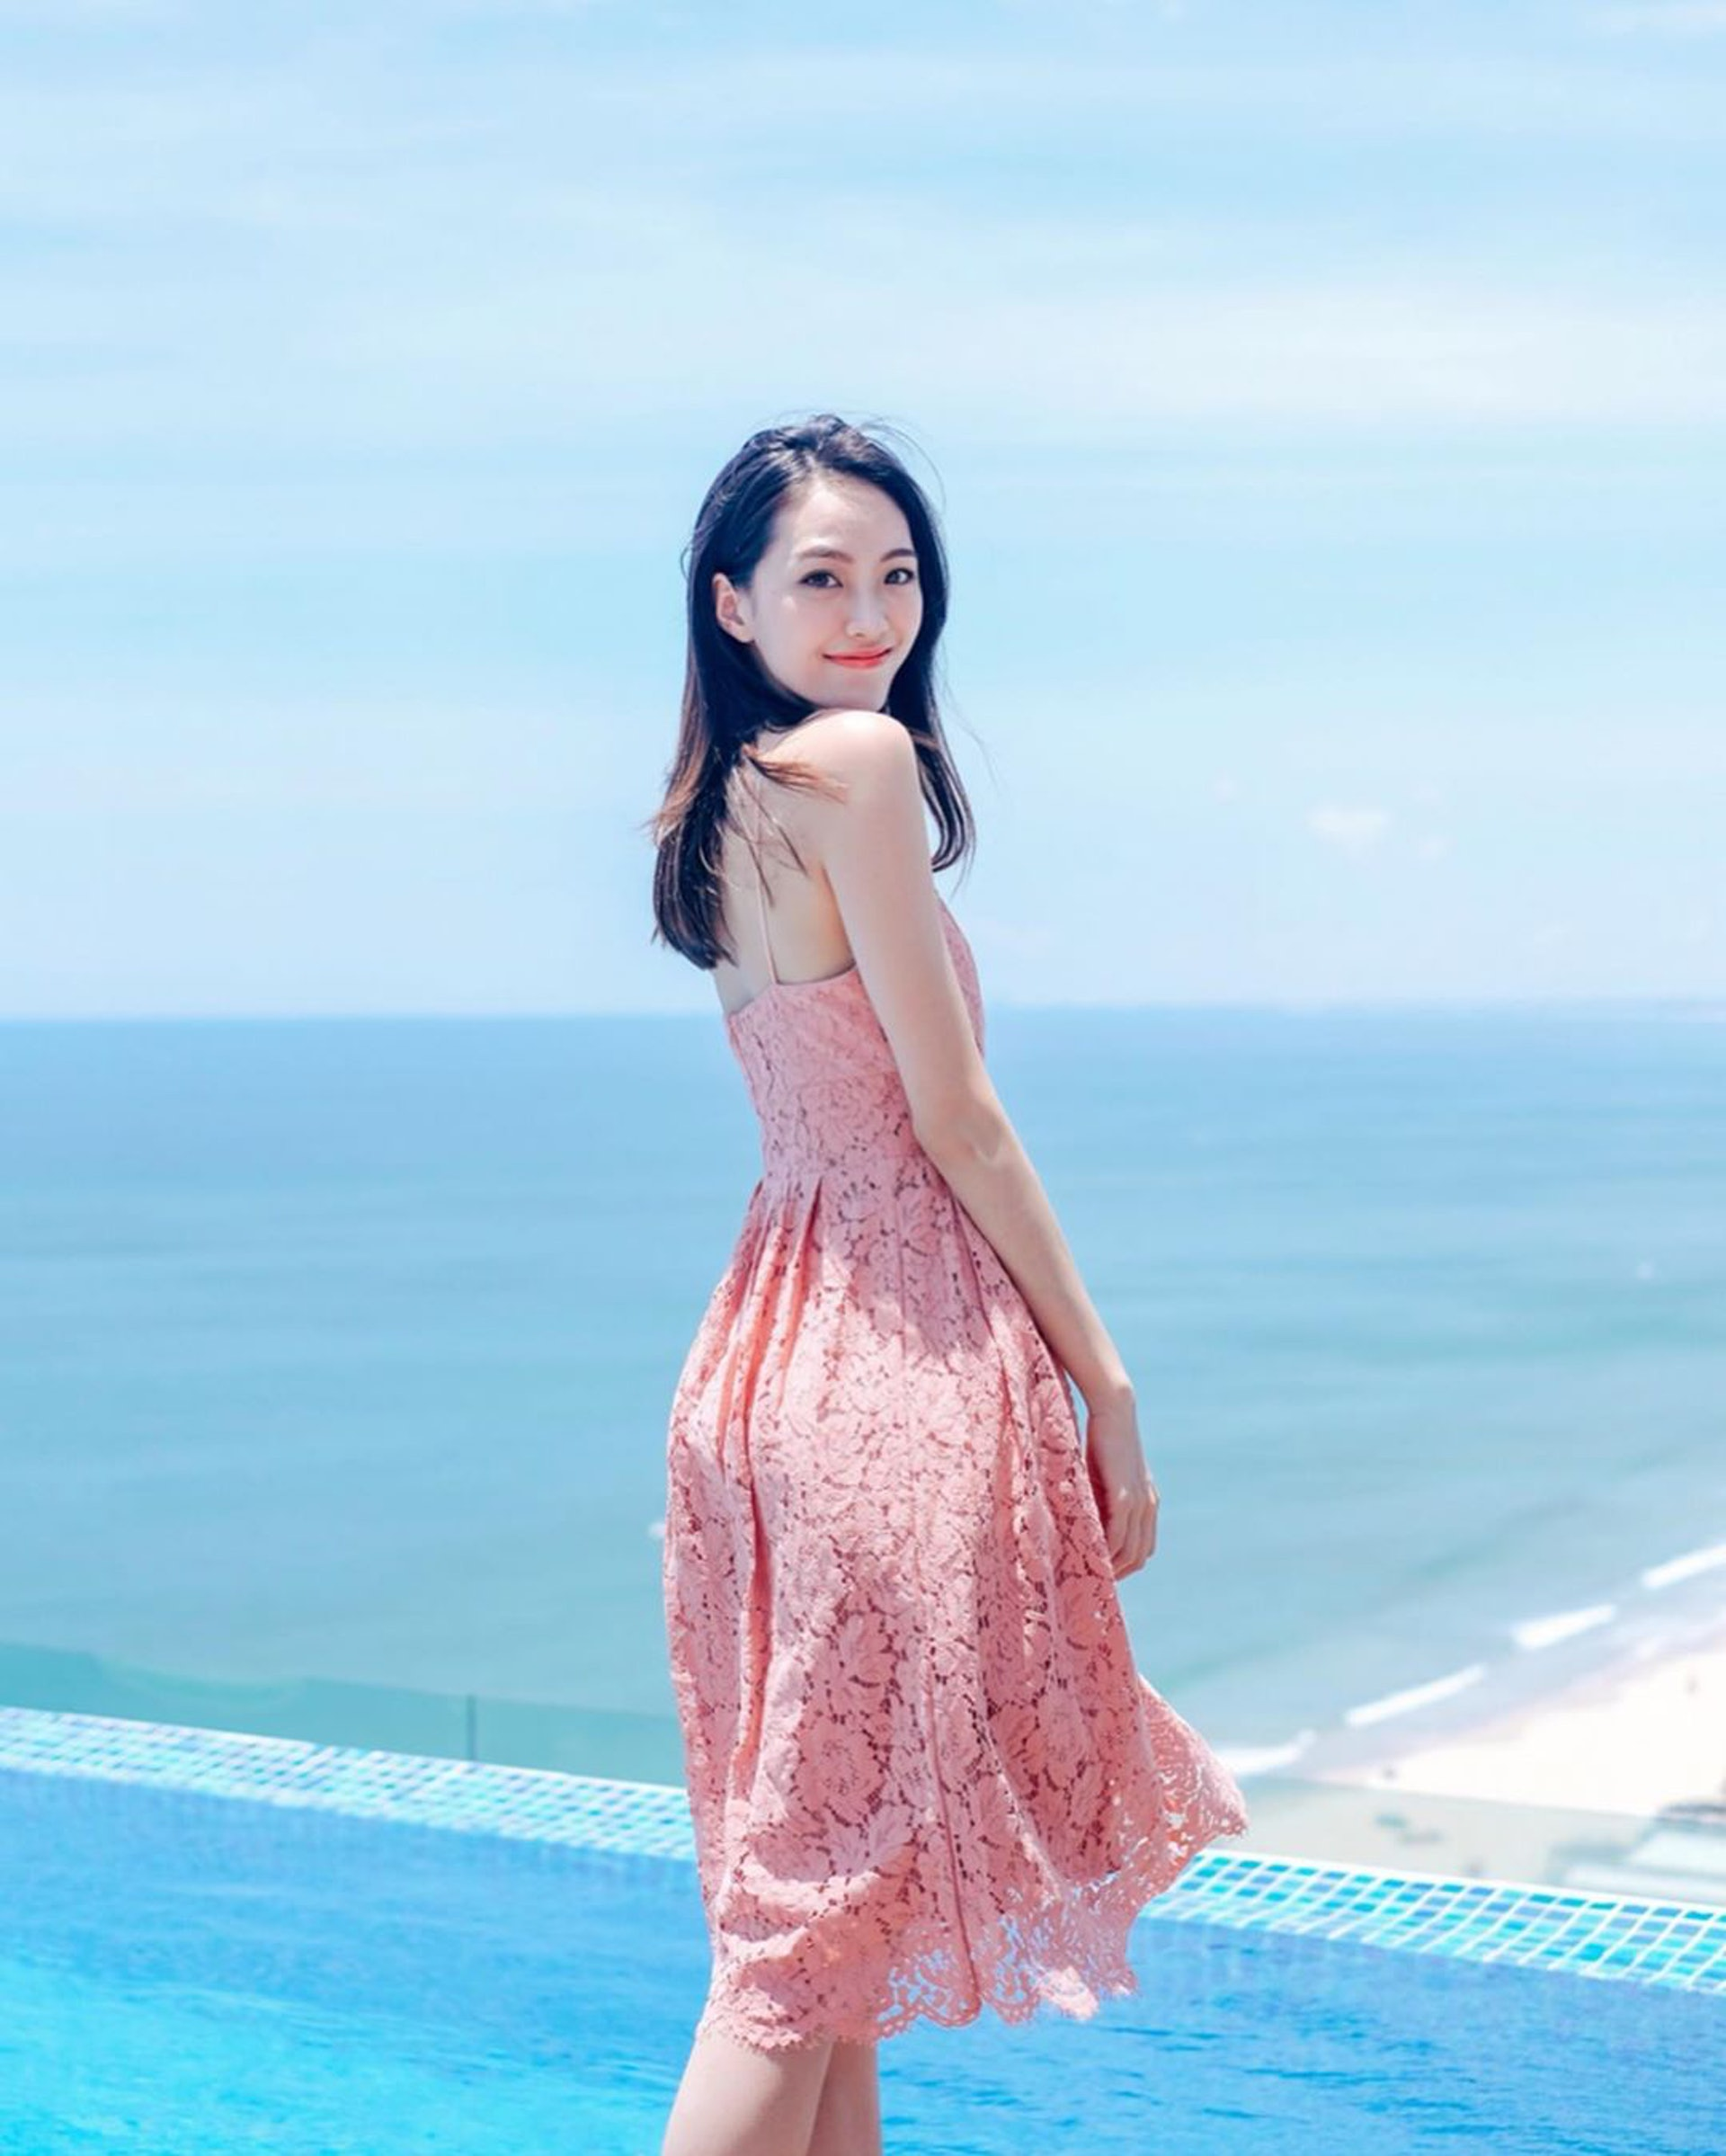 Katy有model身形(Instagram@katy.wt)